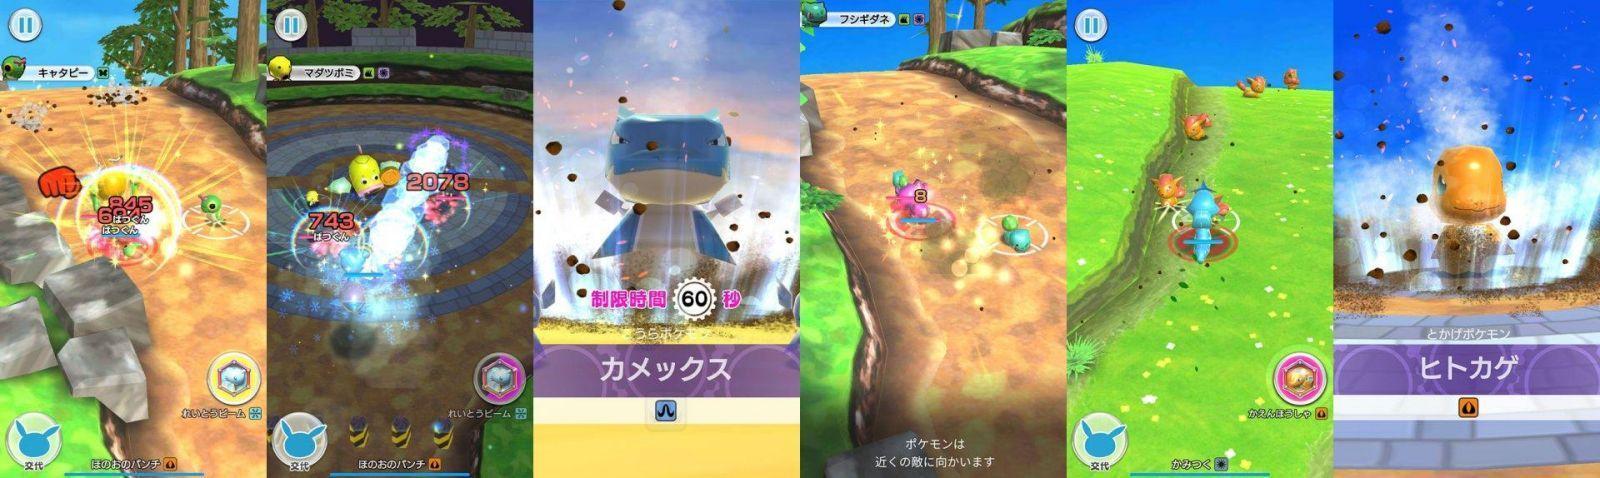 Nintendo неожиданно выпустила новую мобильную игру Pokemon Rumble Rush (top howto slide)